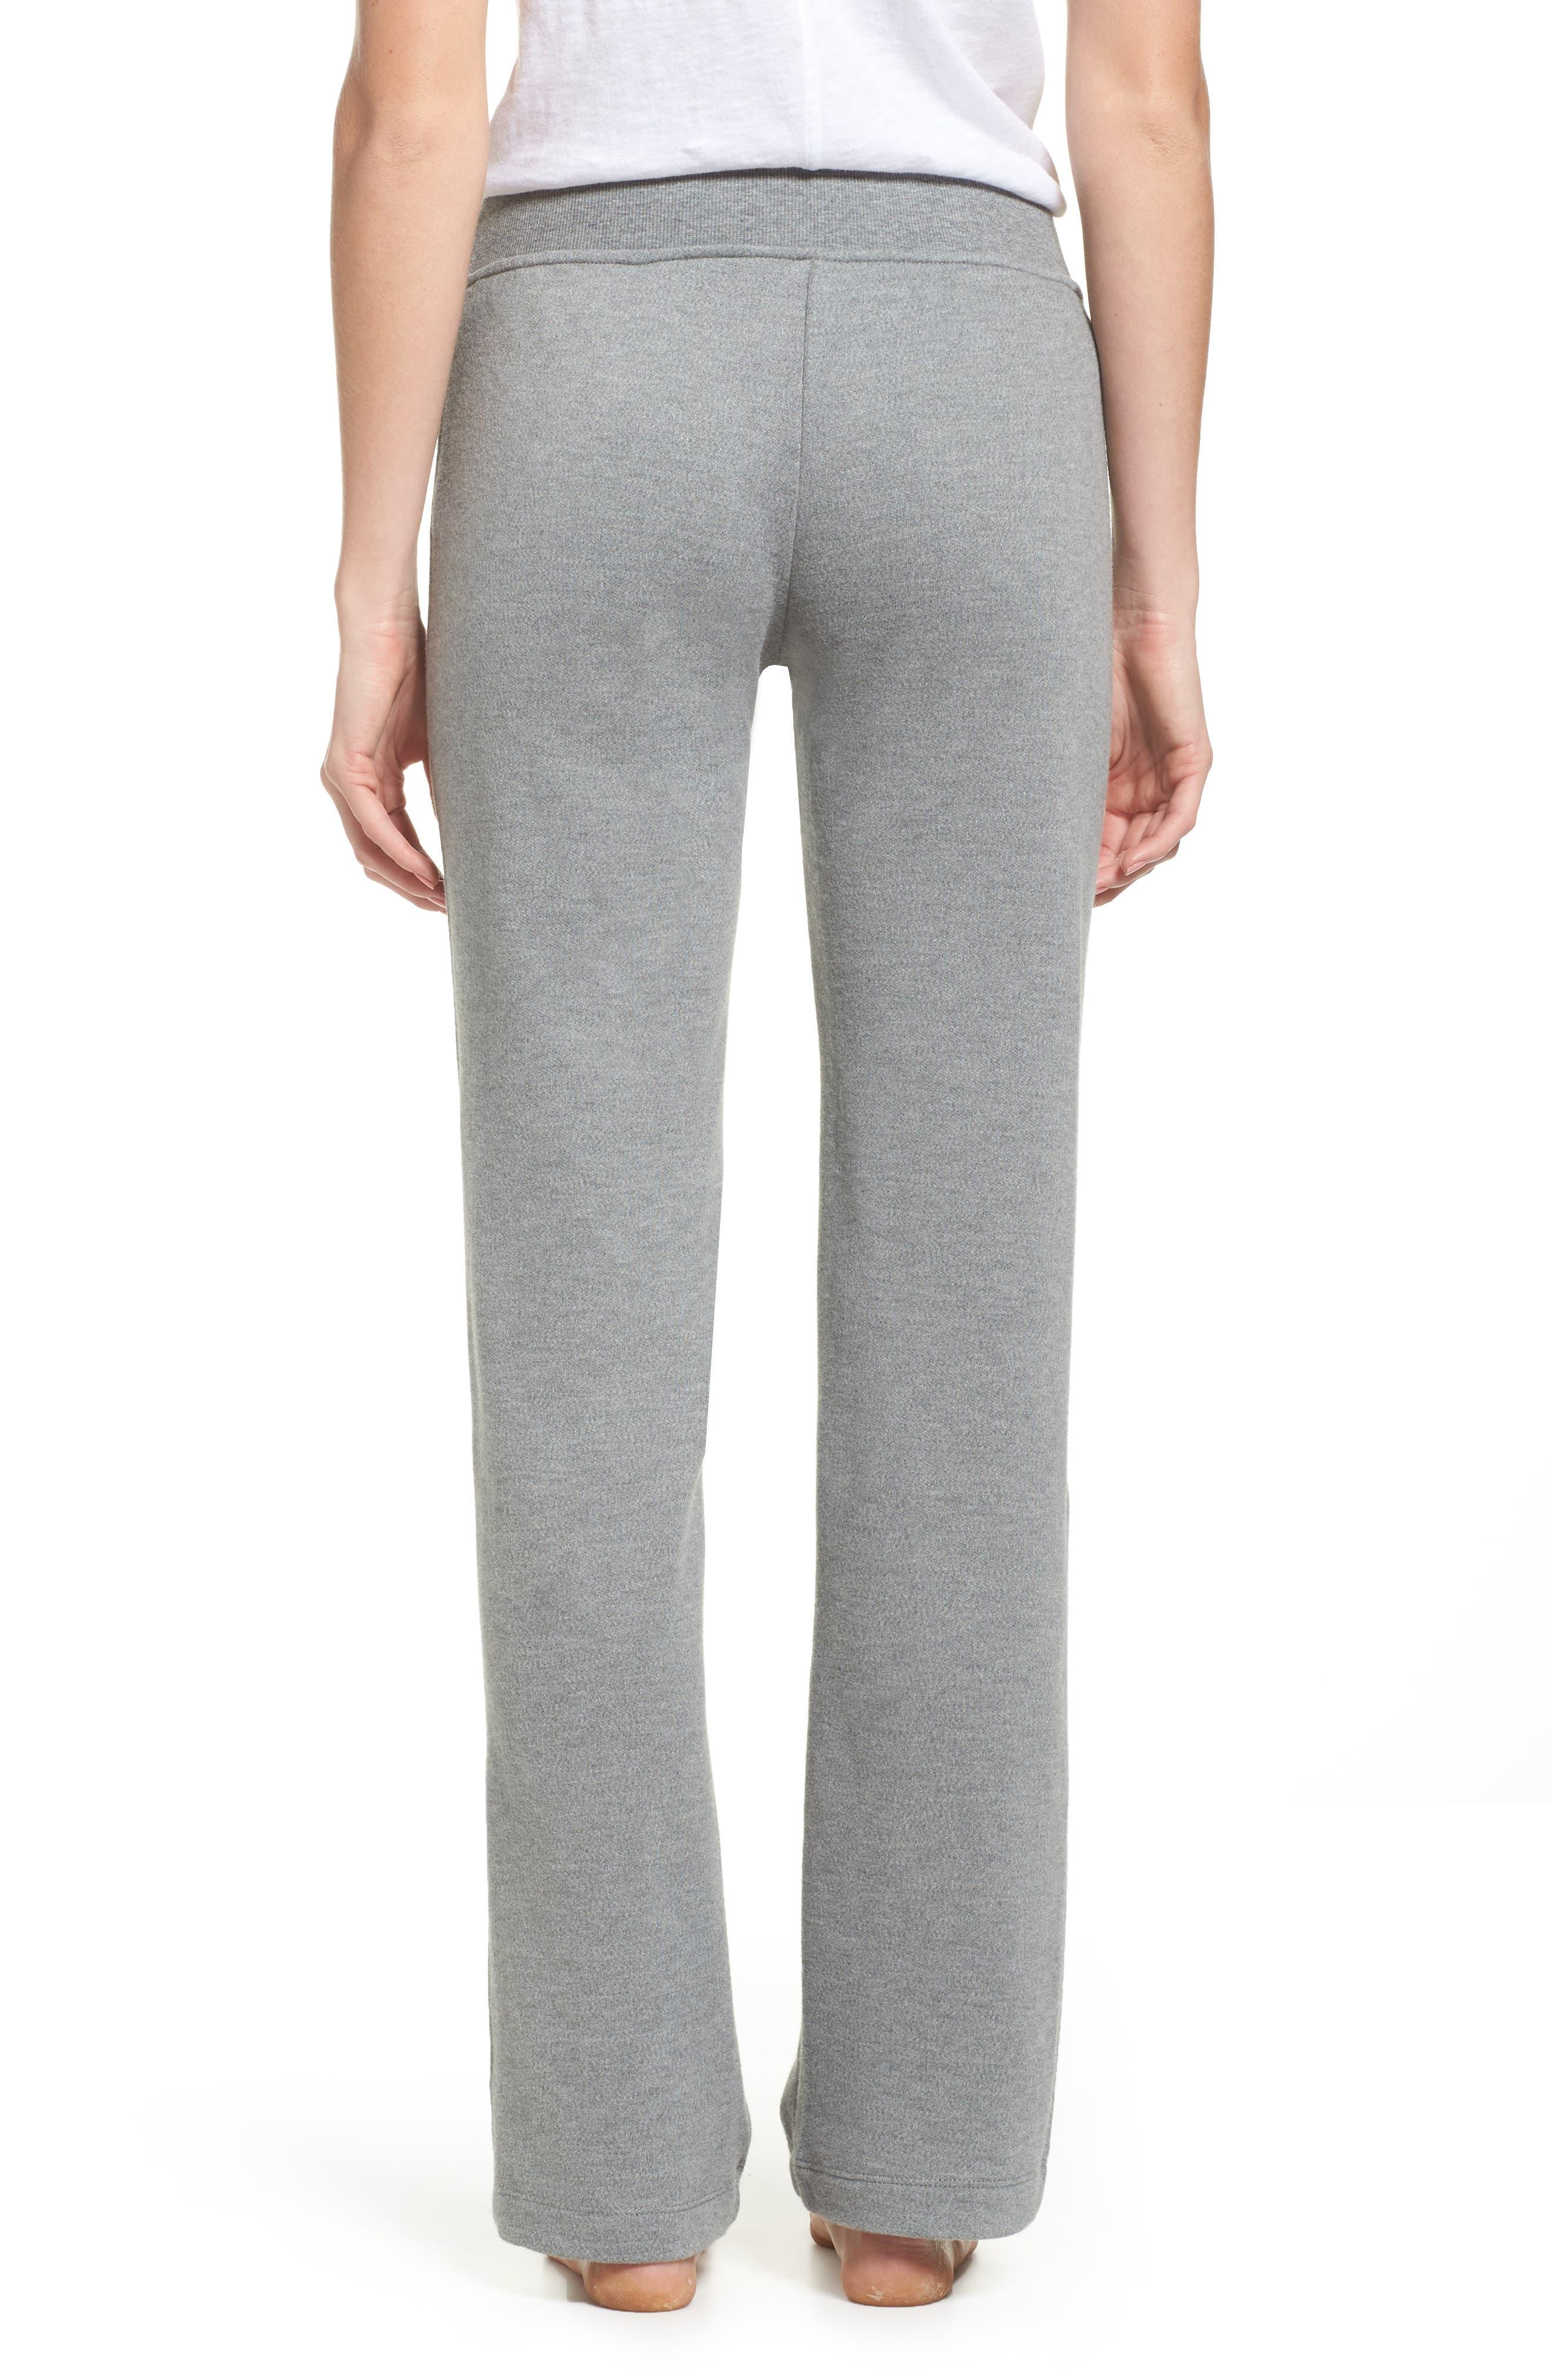 Penny Lounge Pants,                             Alternate thumbnail 2, color,                             Grey Heather